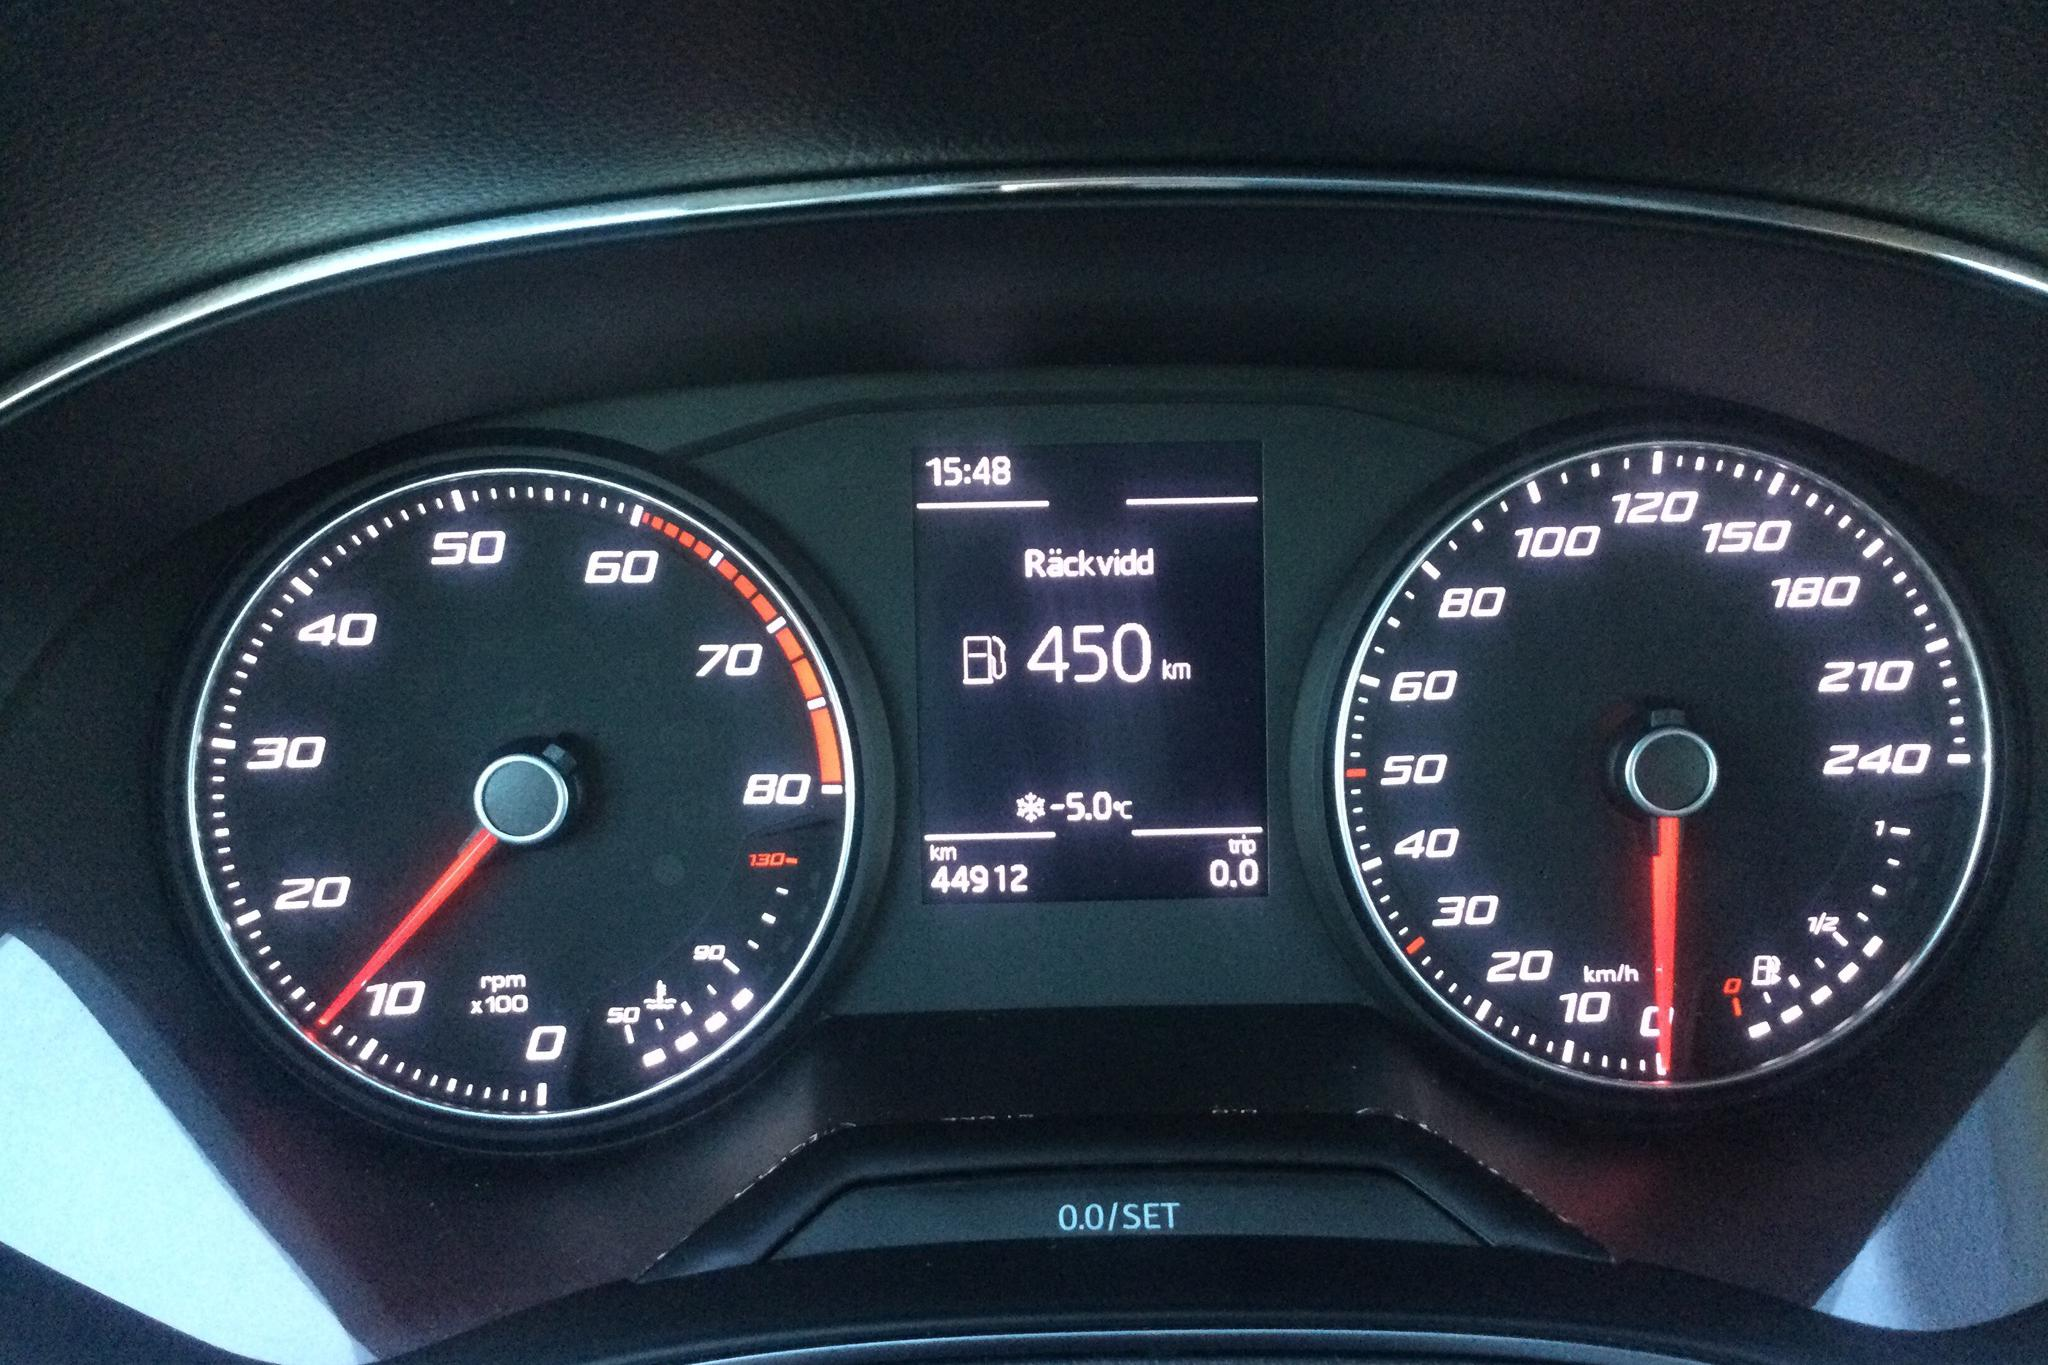 Seat Arona 1.0 TSI 5dr (95hk) - 4 491 mil - Manuell - vit - 2018